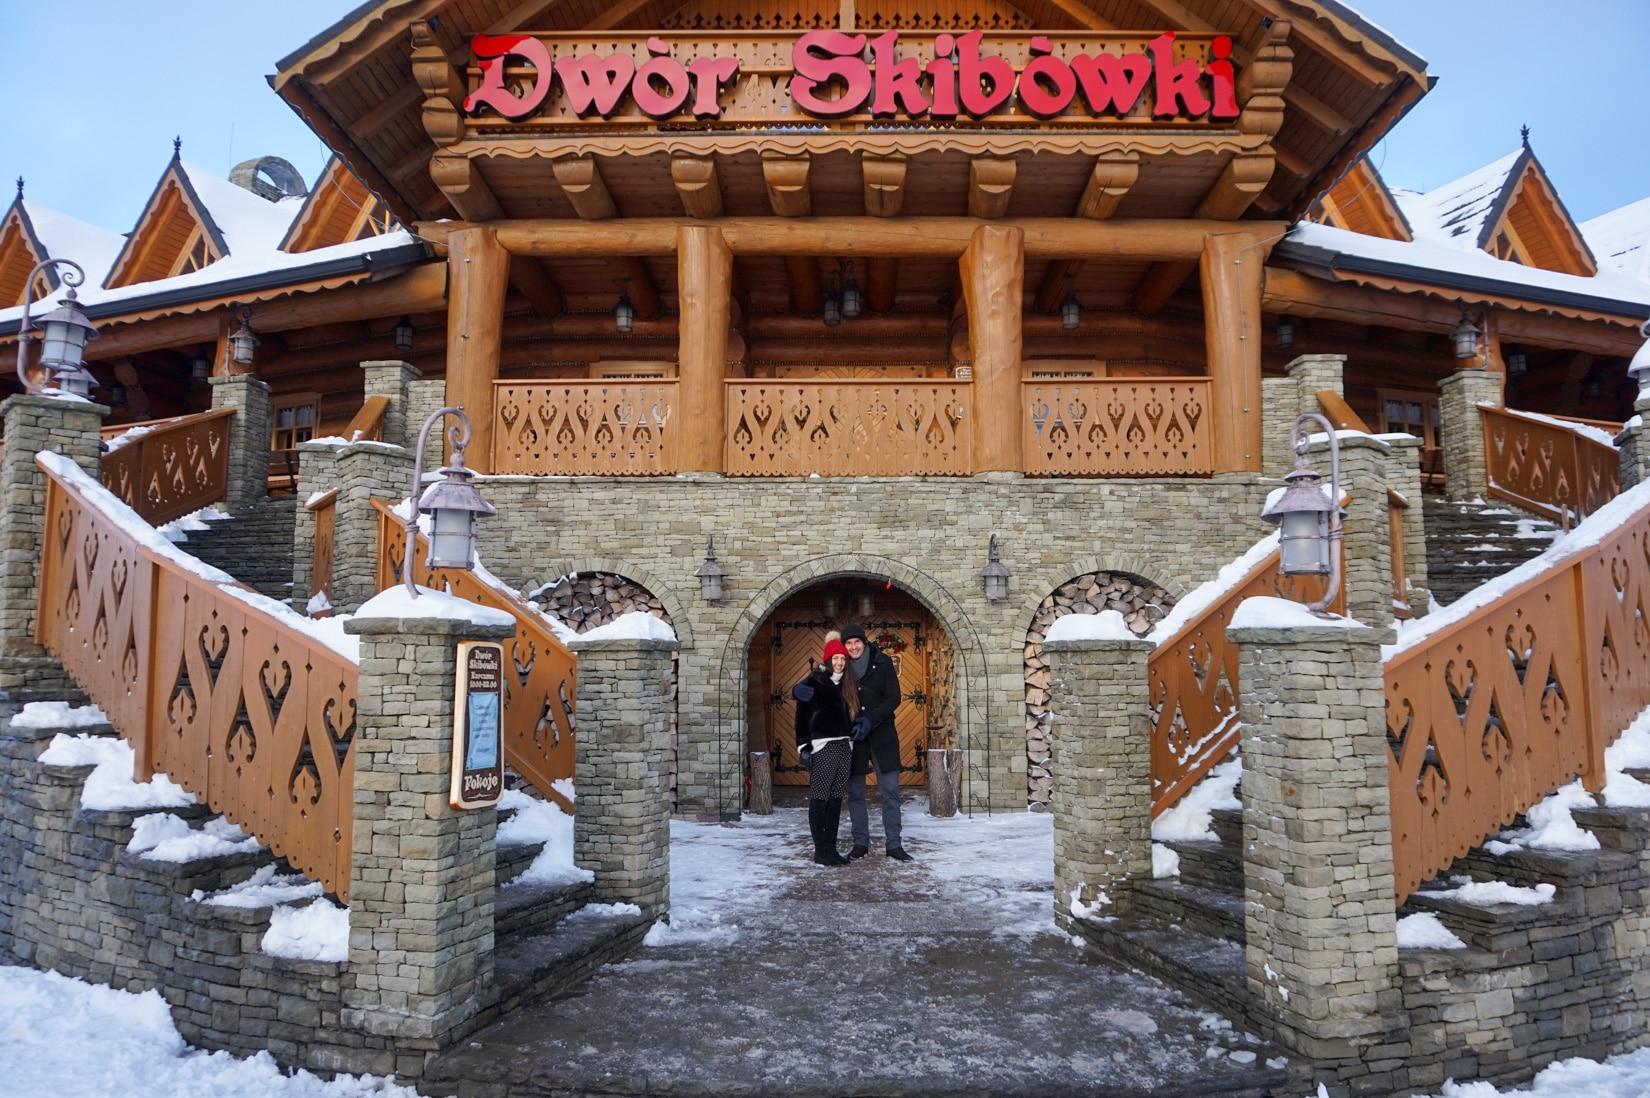 ustron-dwor-skibowki